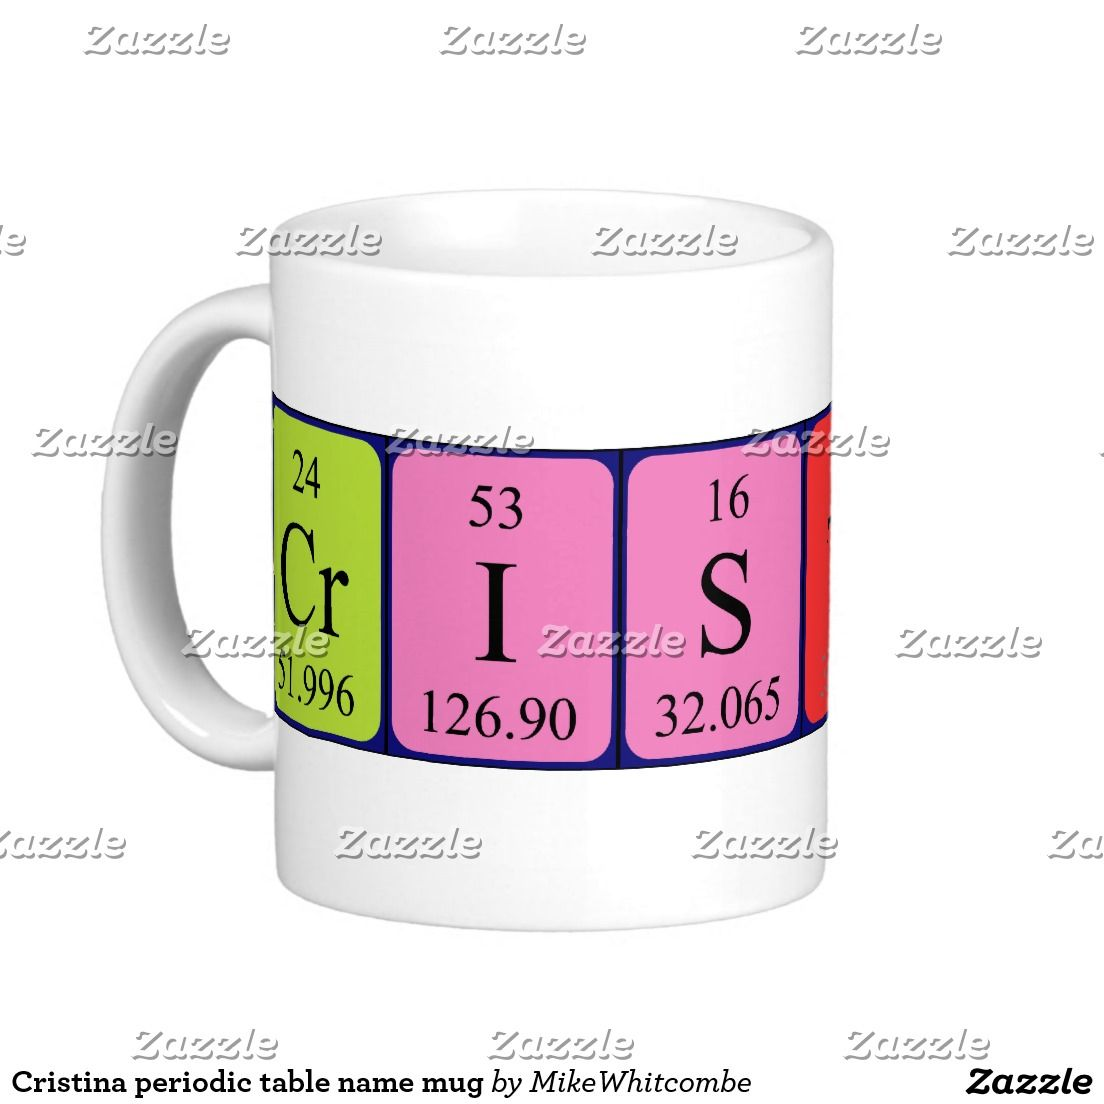 Cristina periodic table name mug june 2016 purchases from my cristina periodic table name mug urtaz Image collections